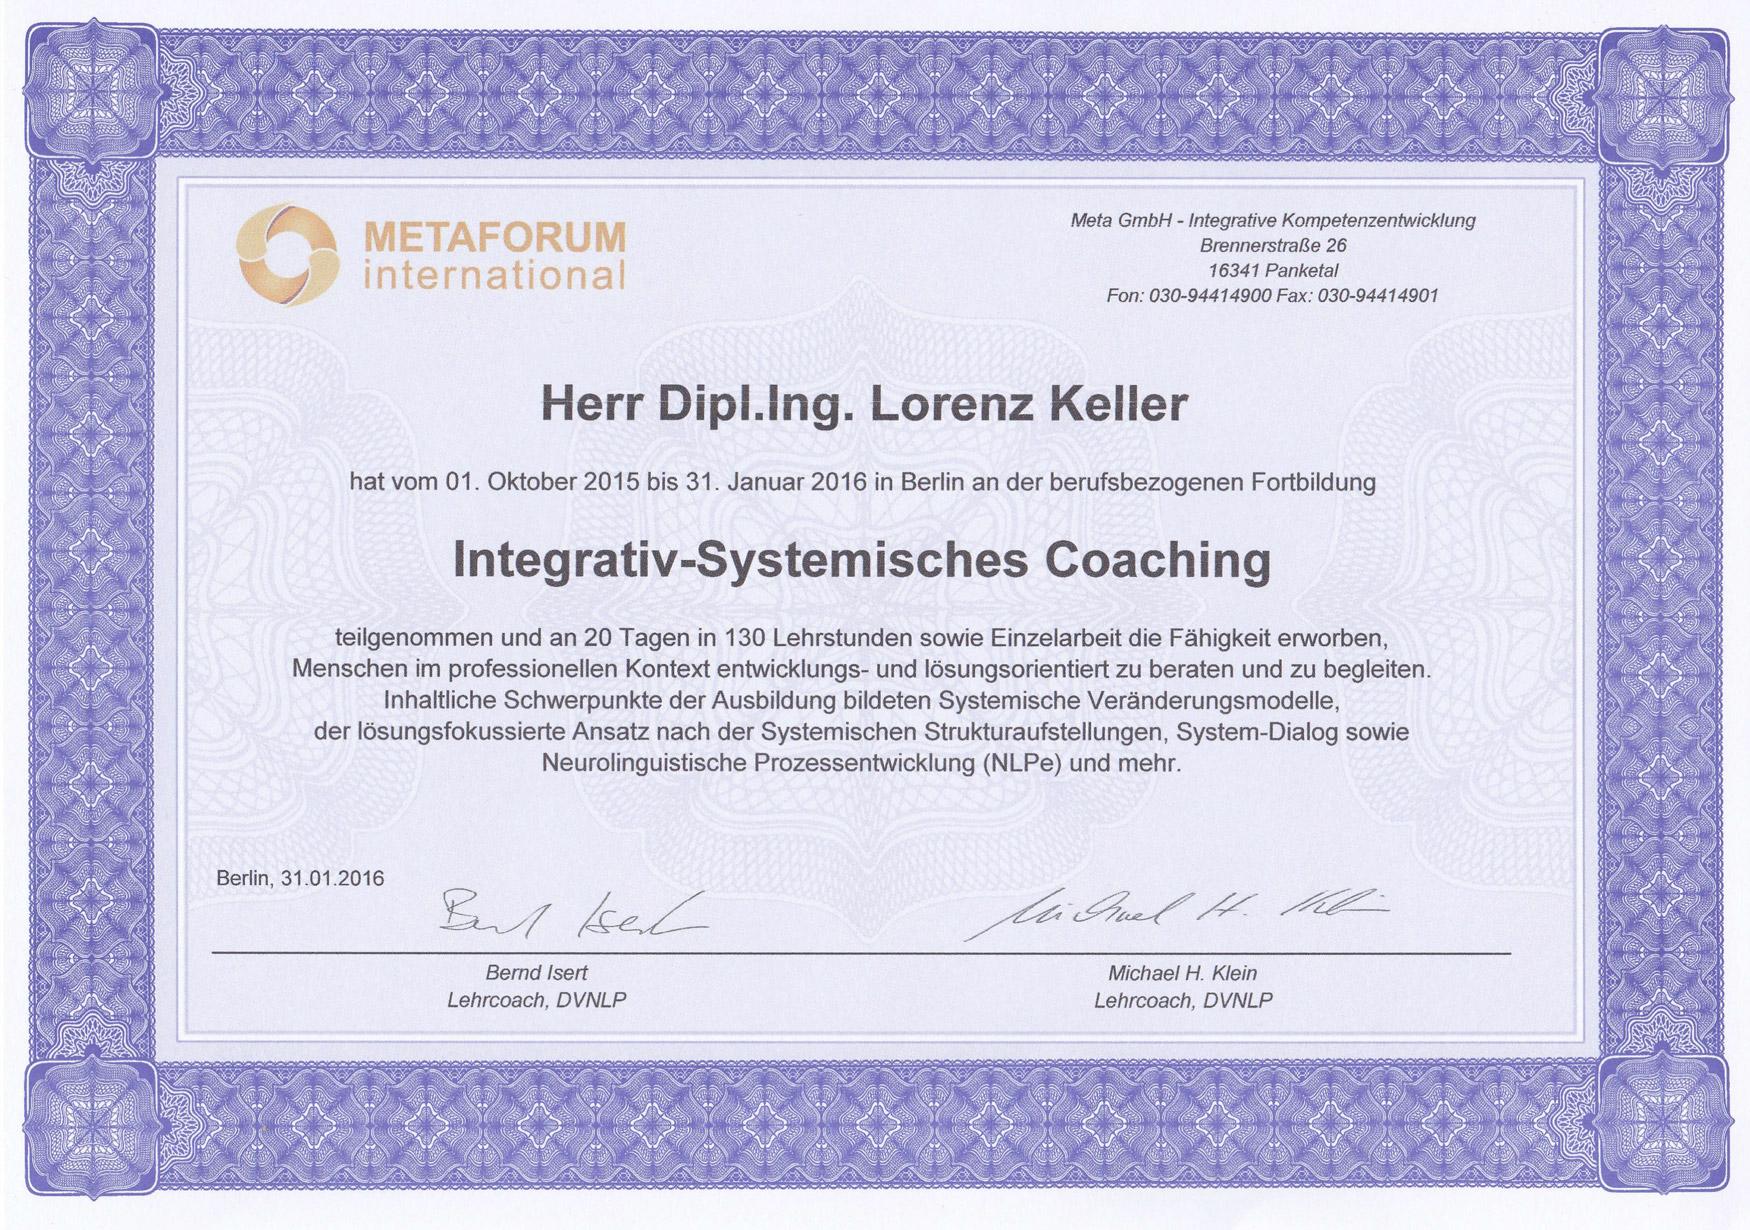 Integrativ Systematisches Coaching